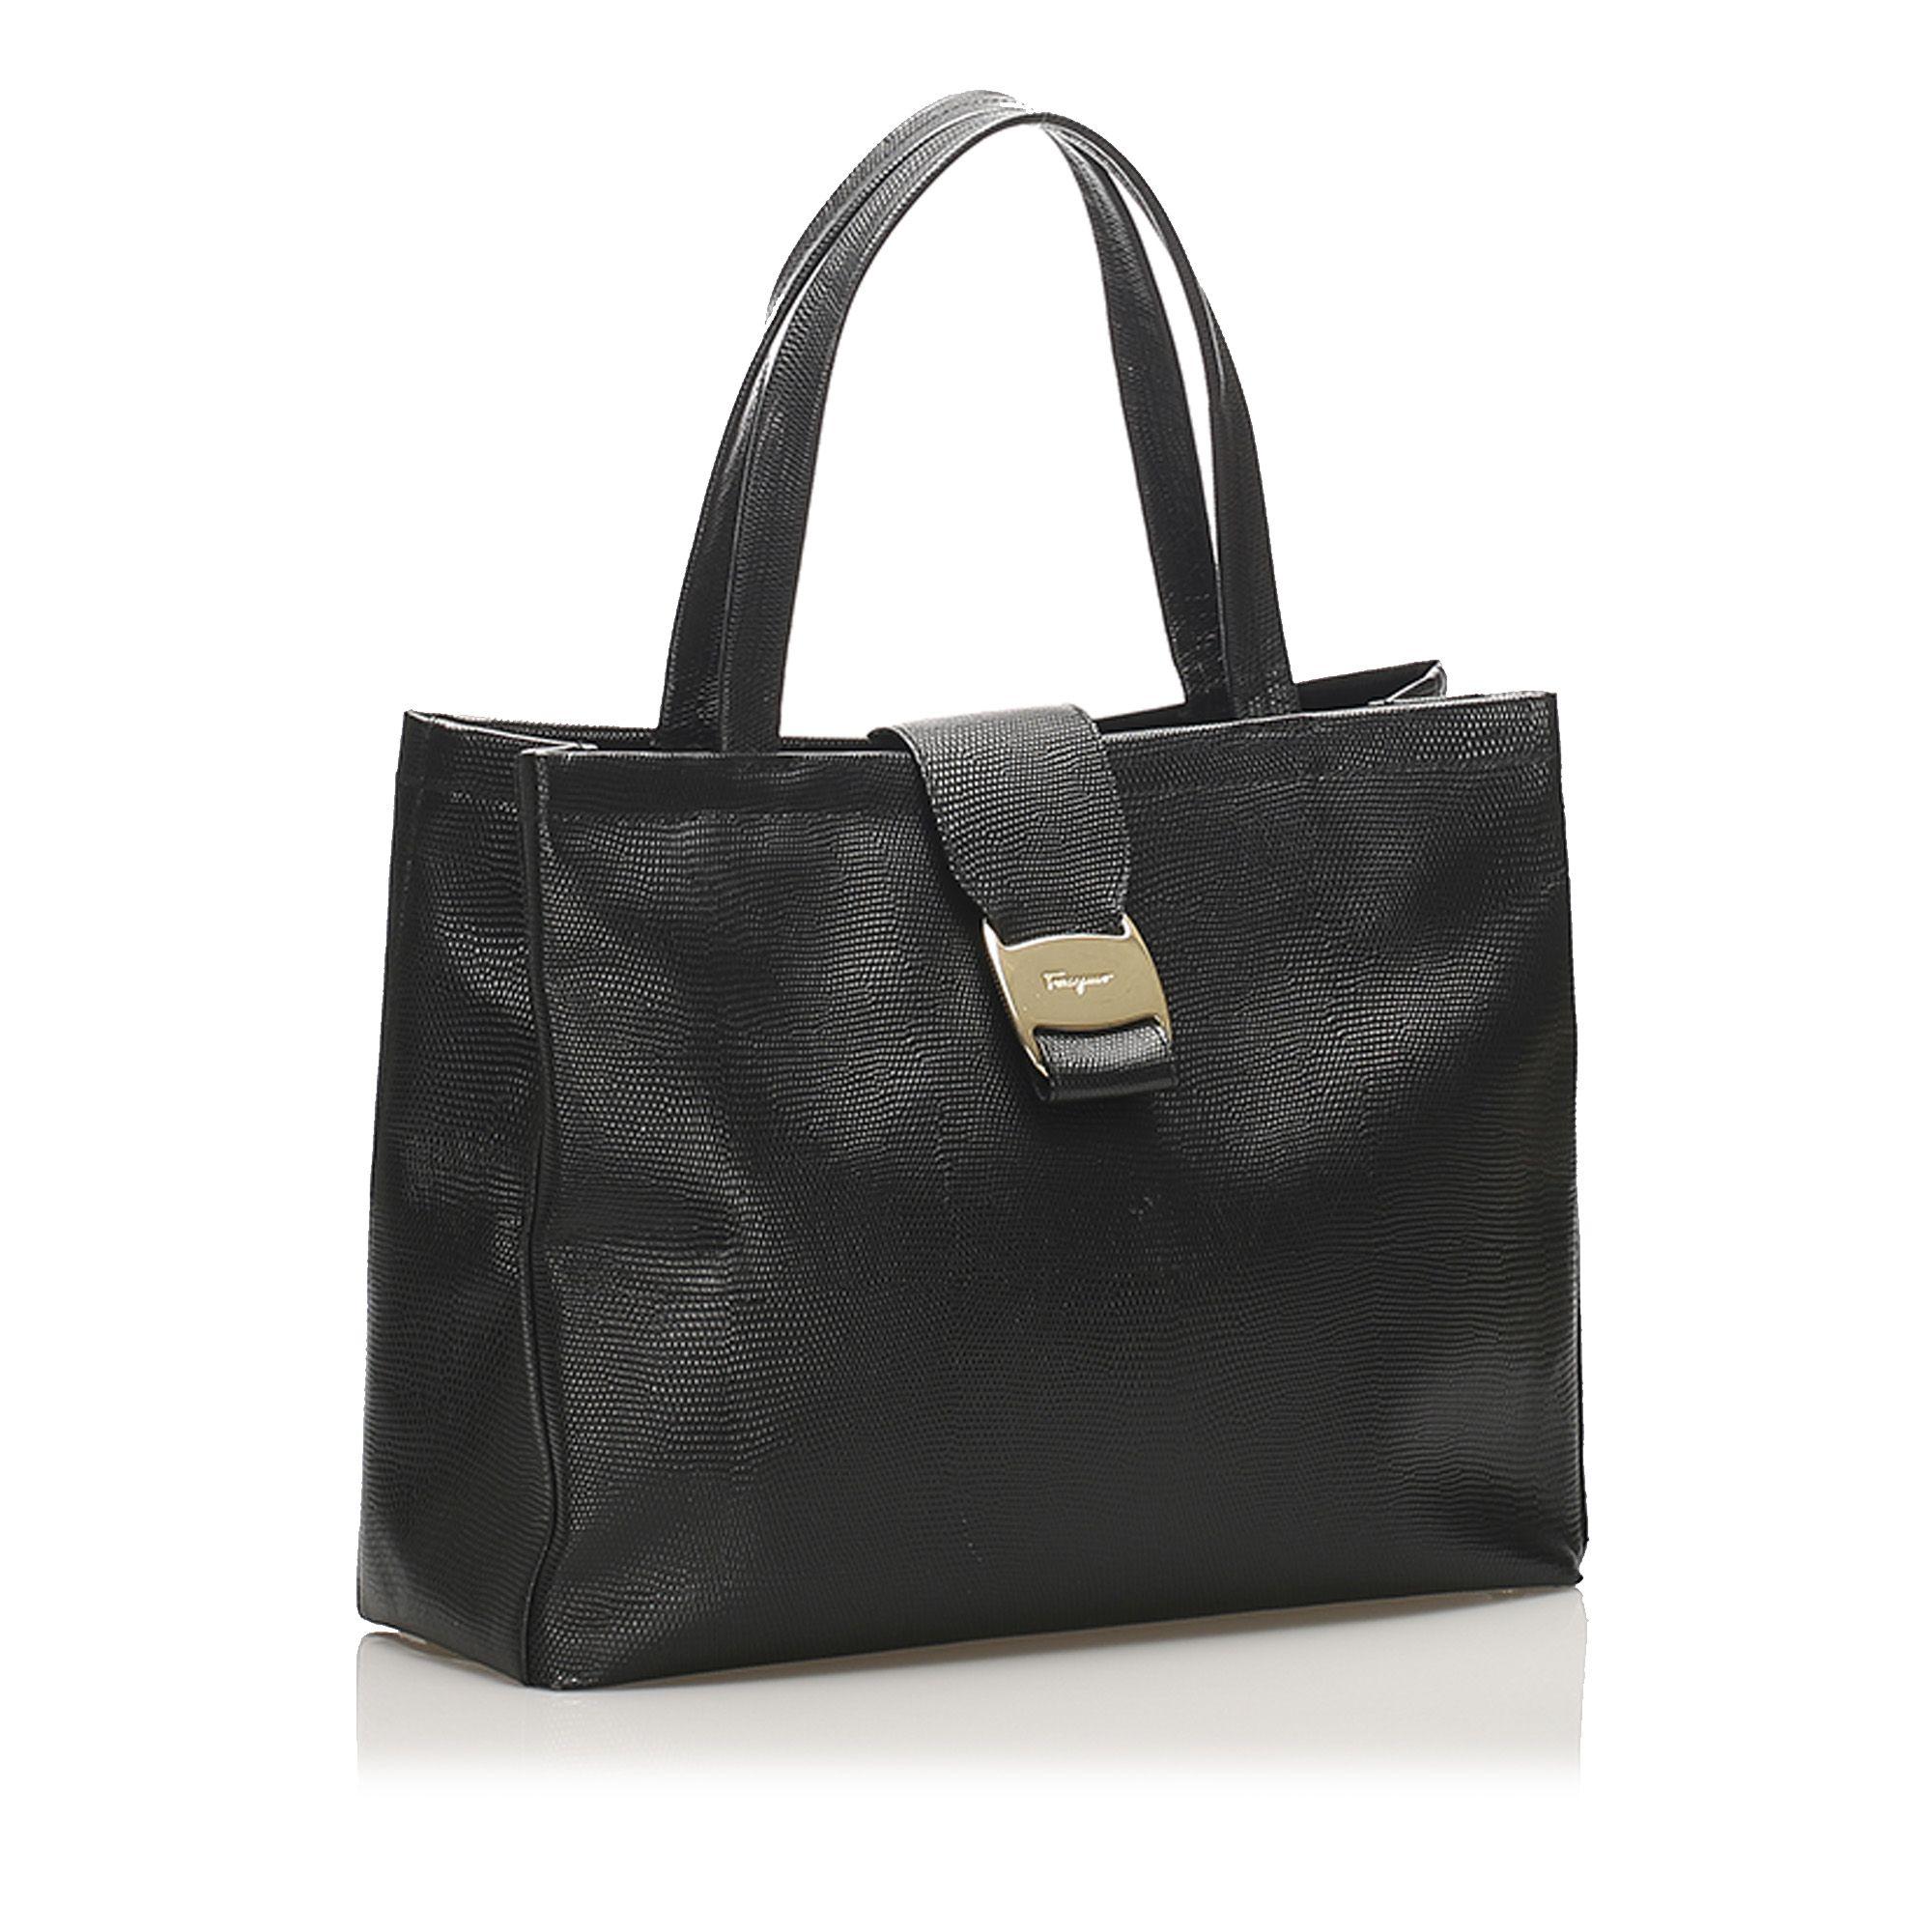 Vintage Ferragamo Vara Leather Handbag Black